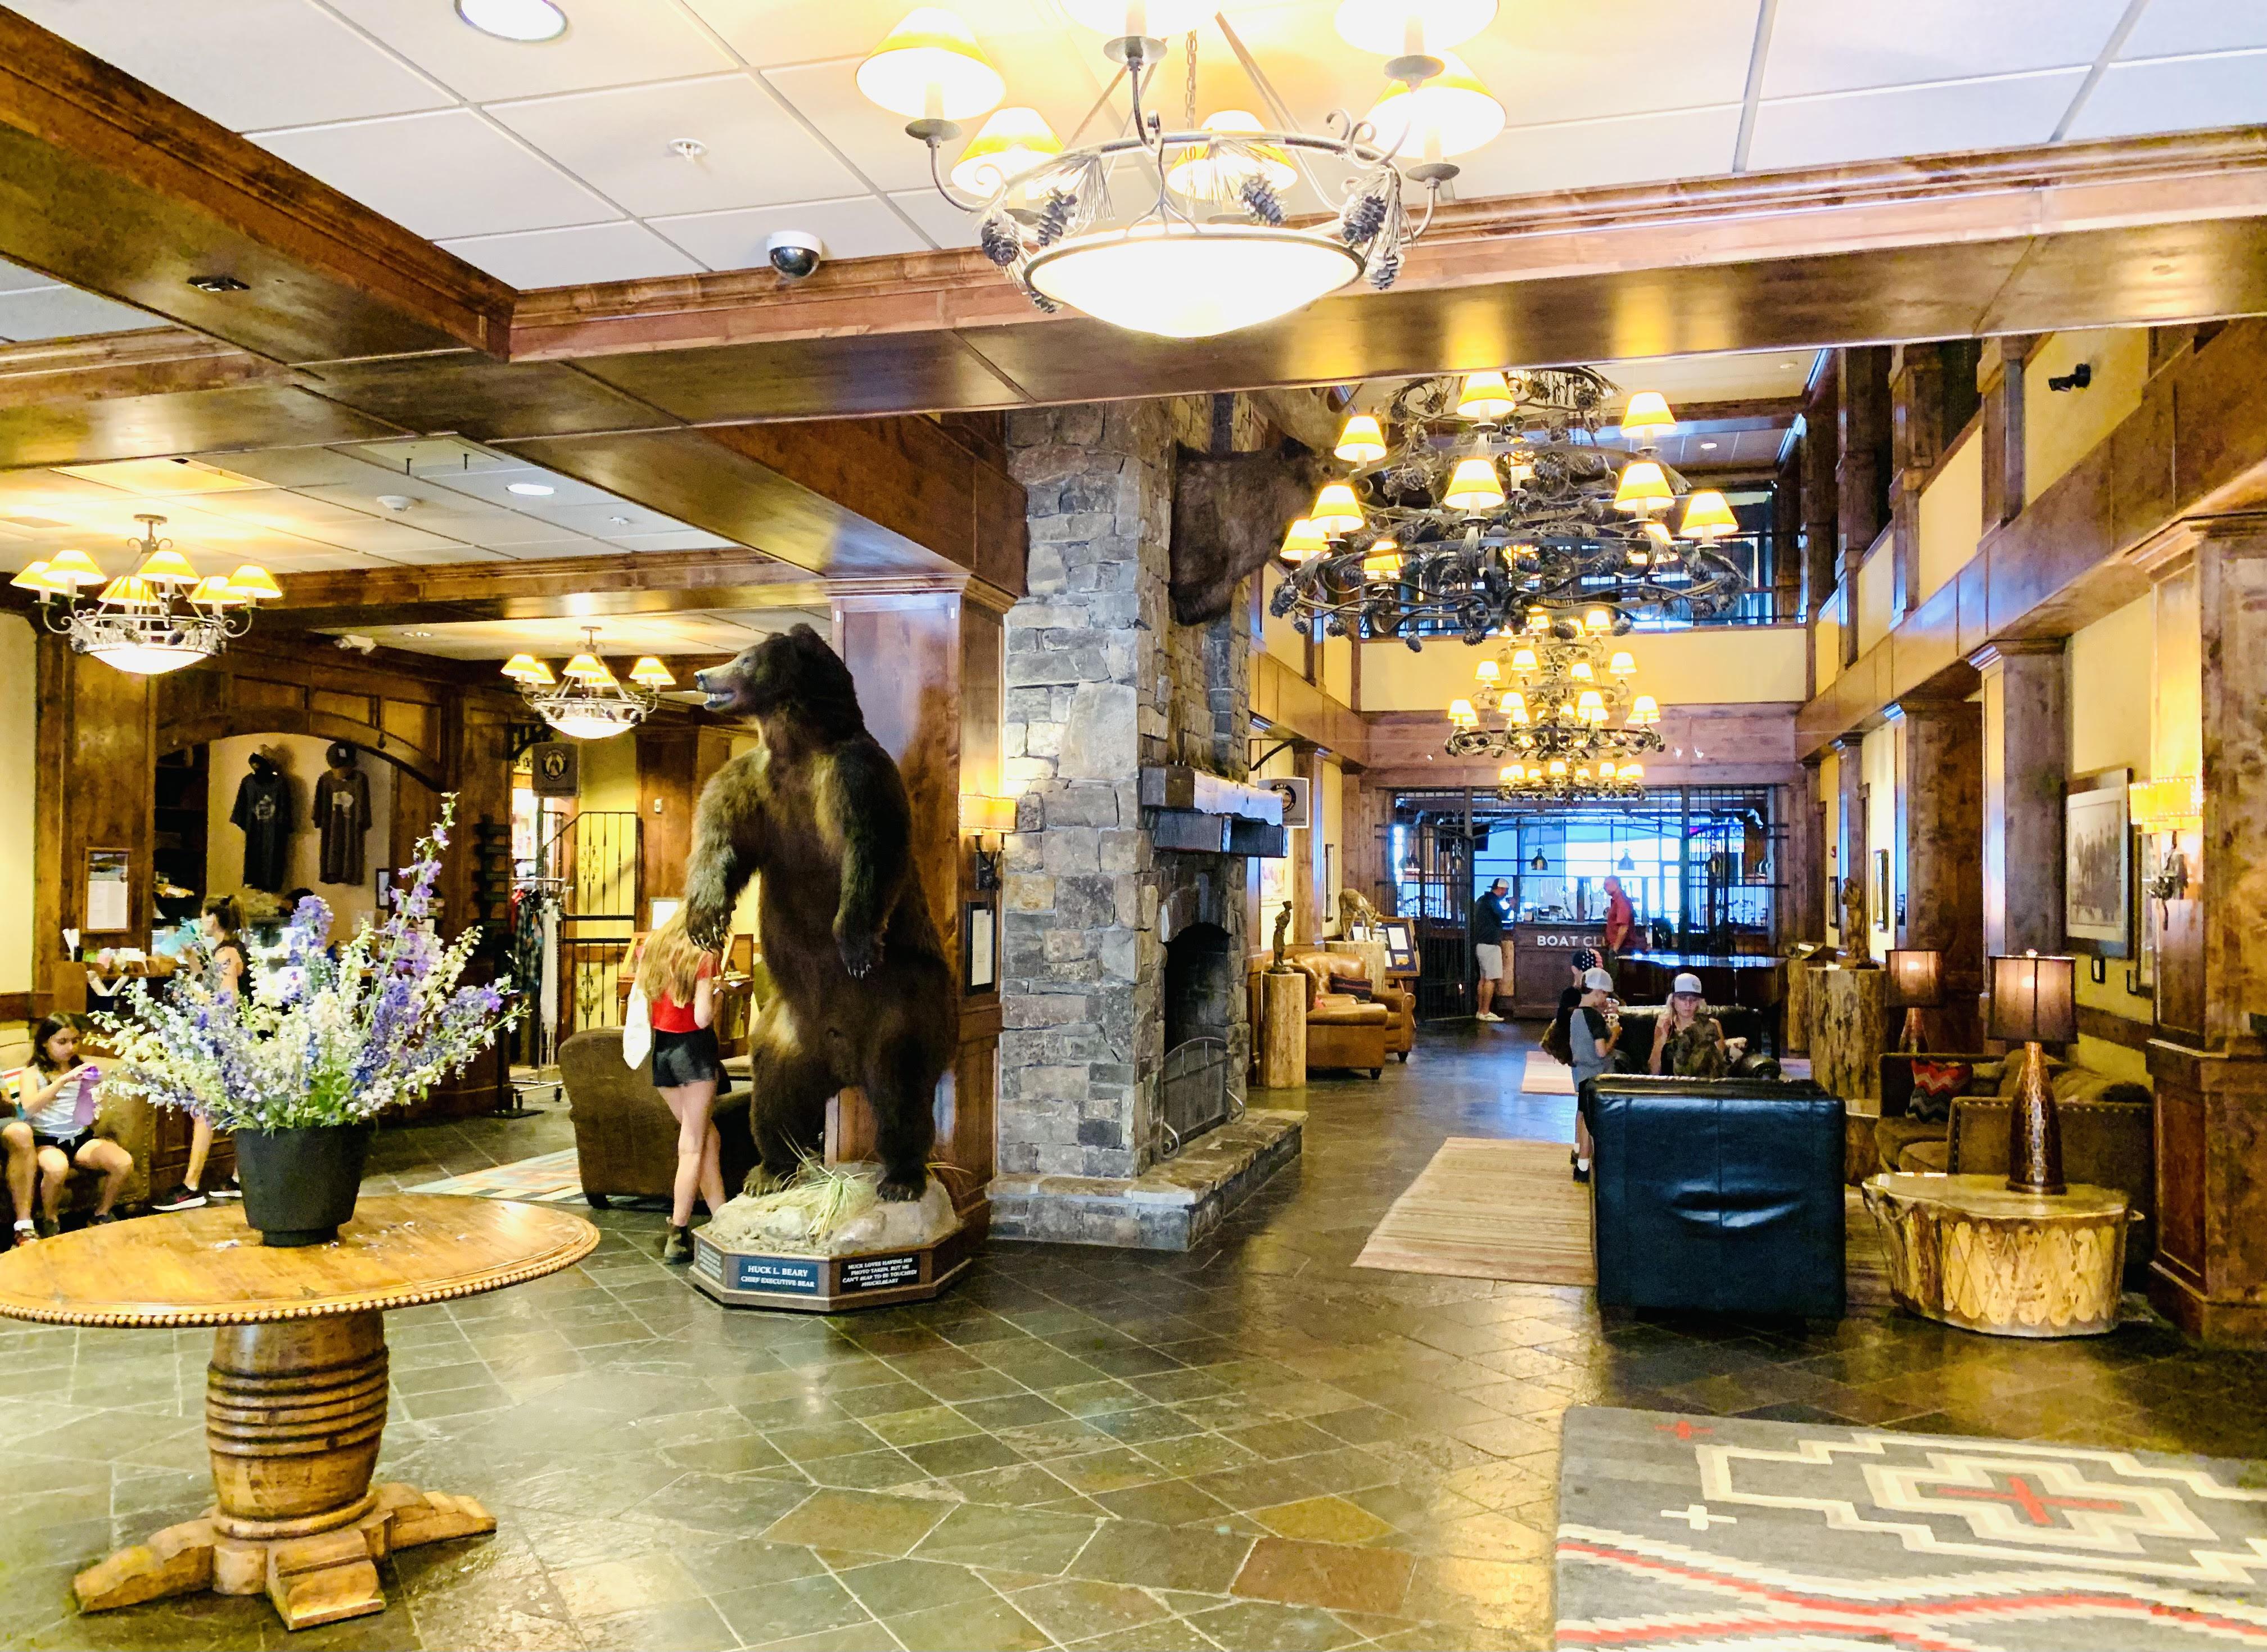 The Lodge at Whitefish Lake lobby